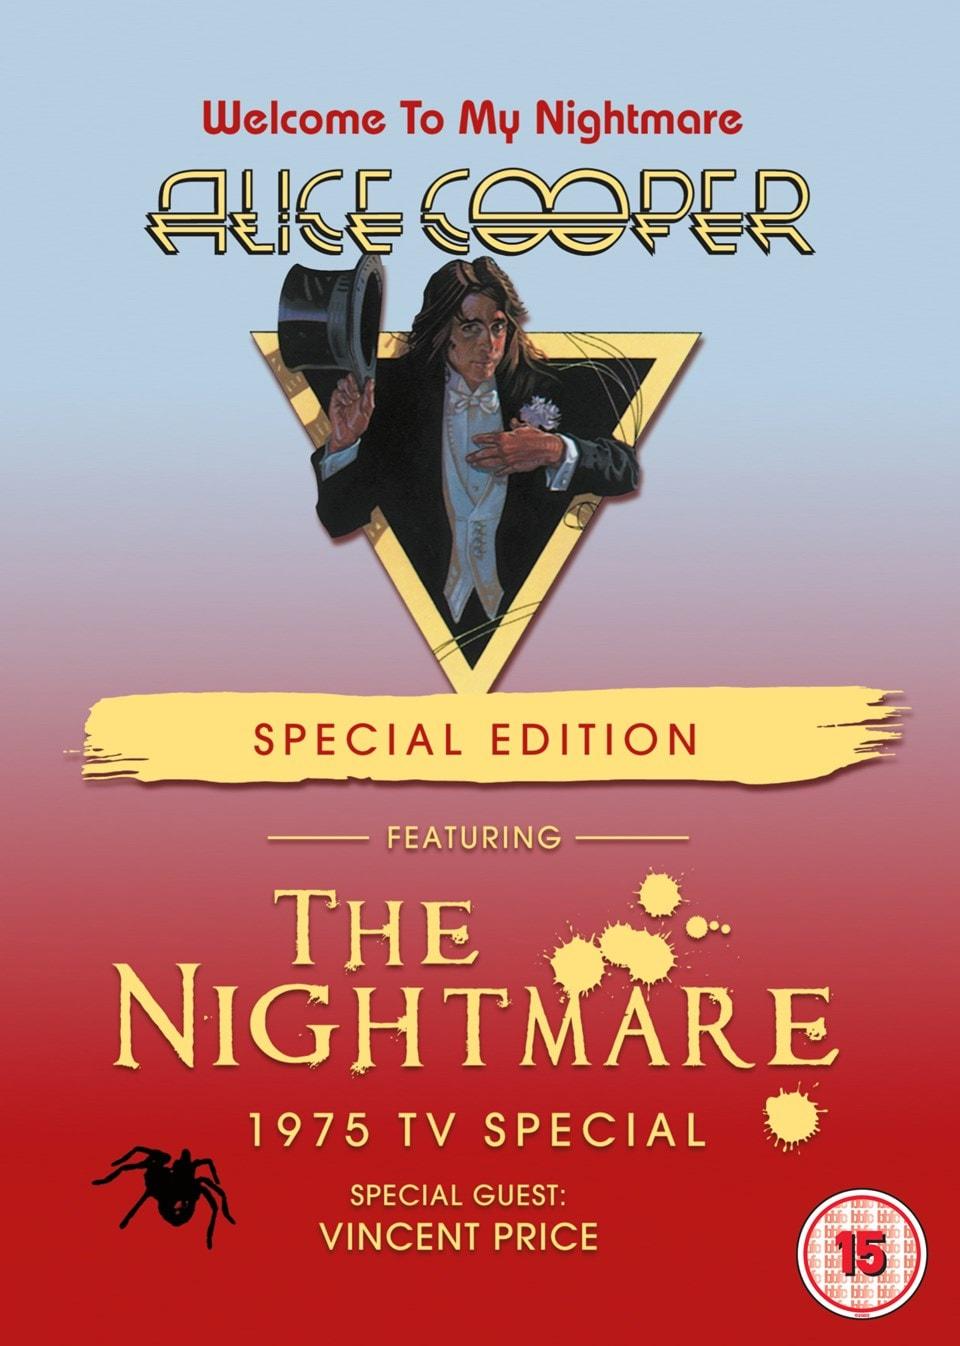 Alice Cooper: Welcome to My Nightmare/The Nightmare - 1